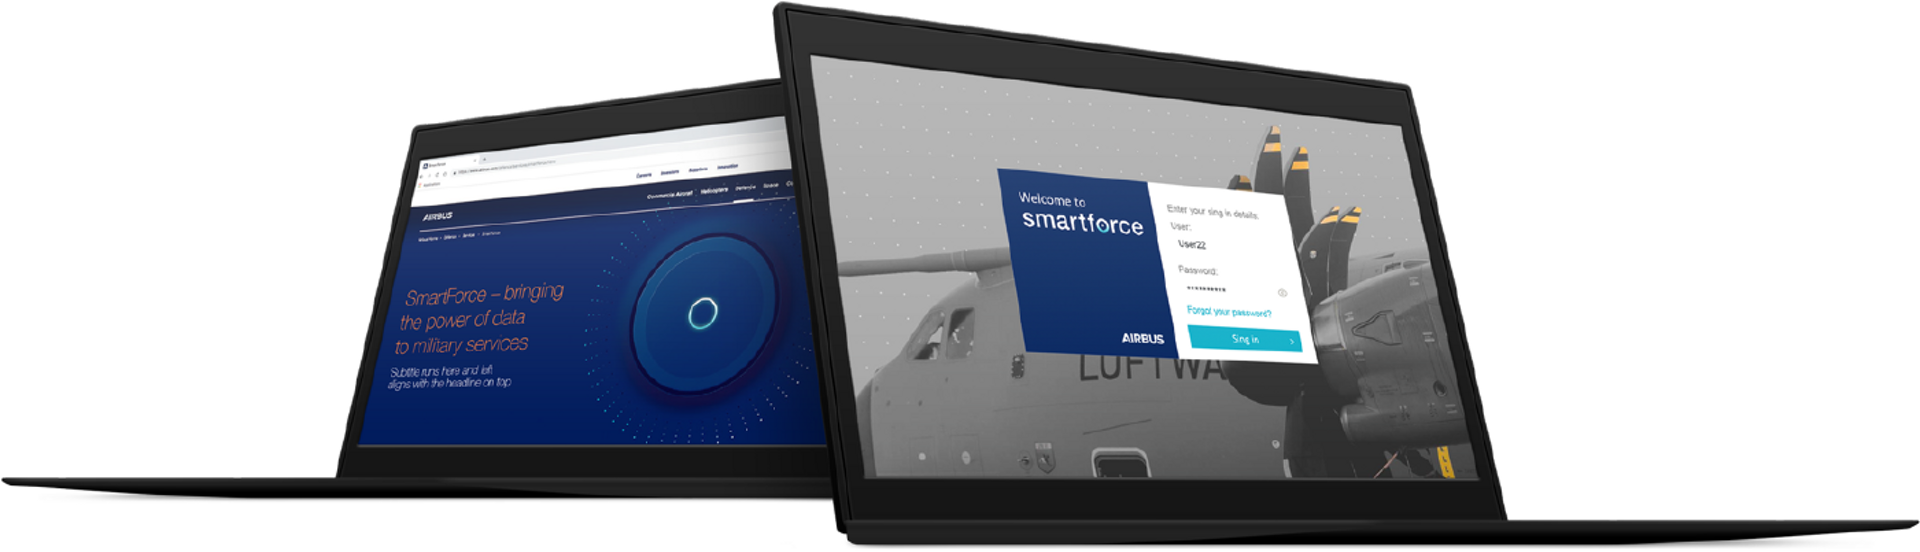 Smartforce Graphicelements Senderidentification